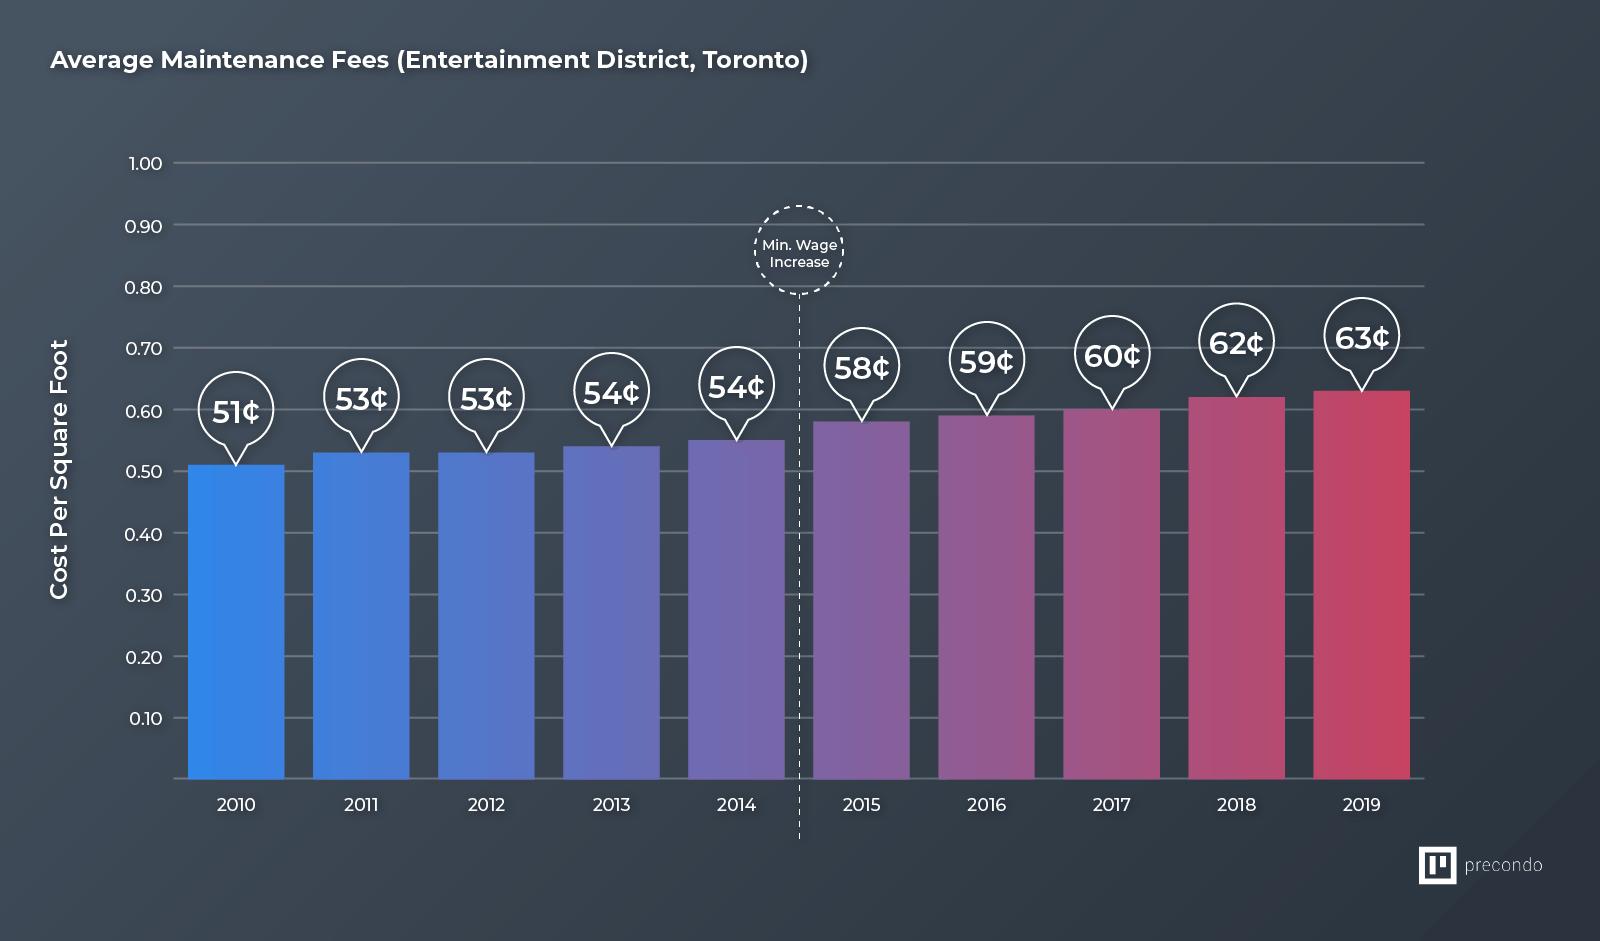 Average Maintenance Fees (Entertainment District, Toronto)